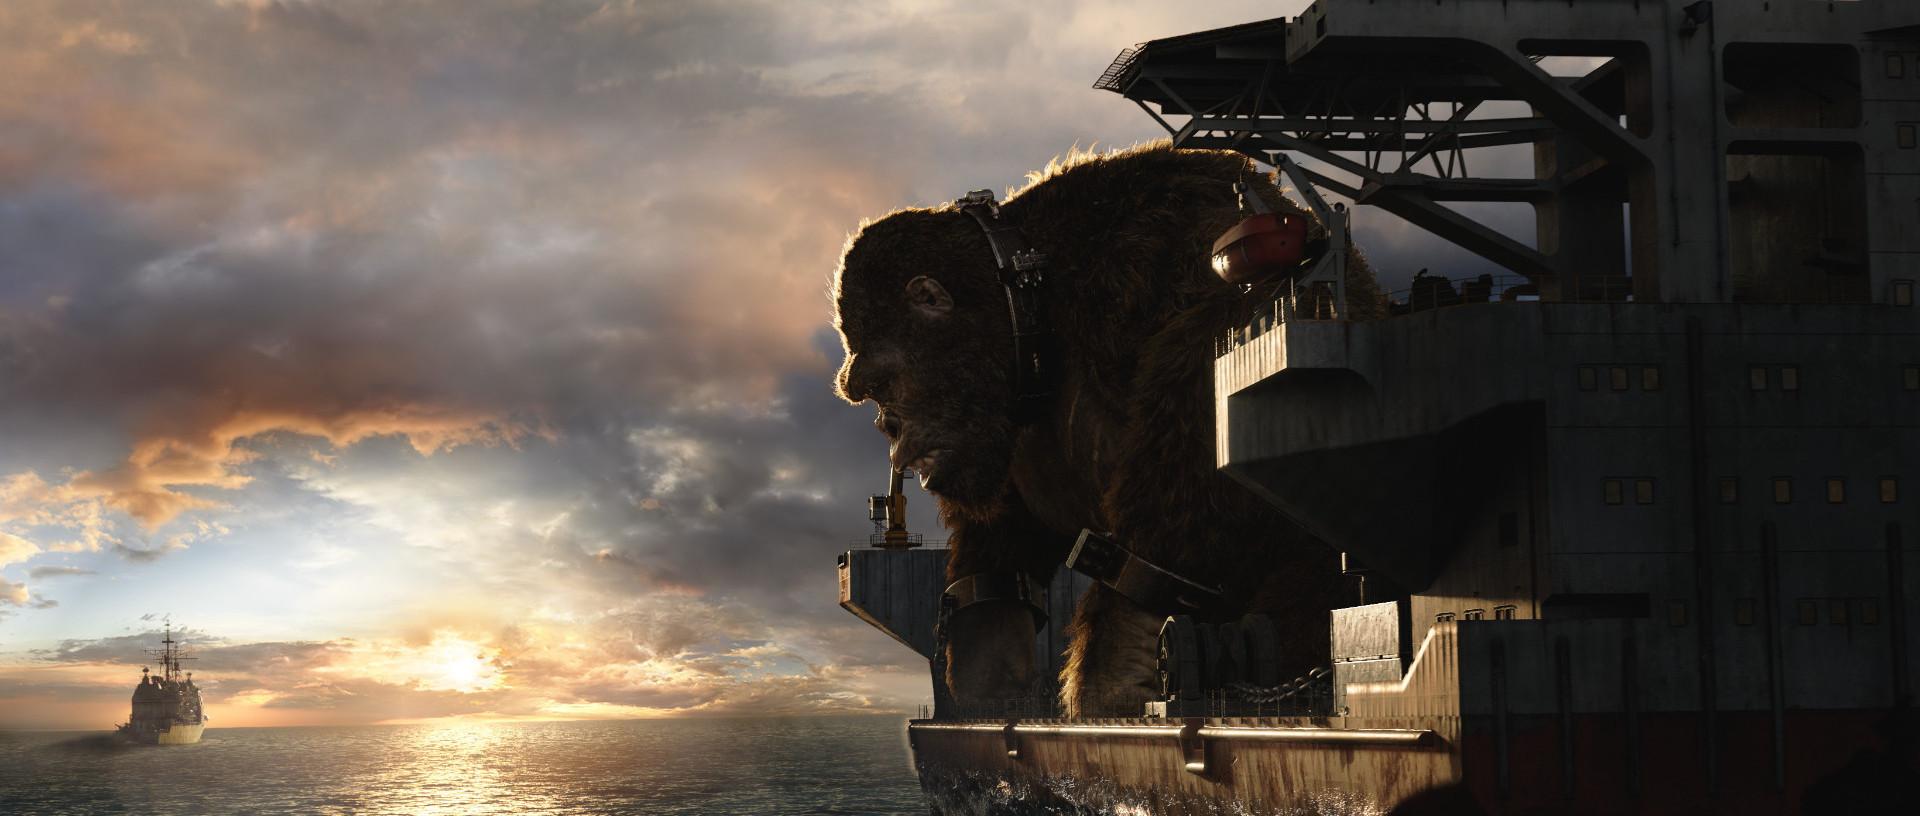 Godzilla vs Kong - visual effects by Scanline VFX